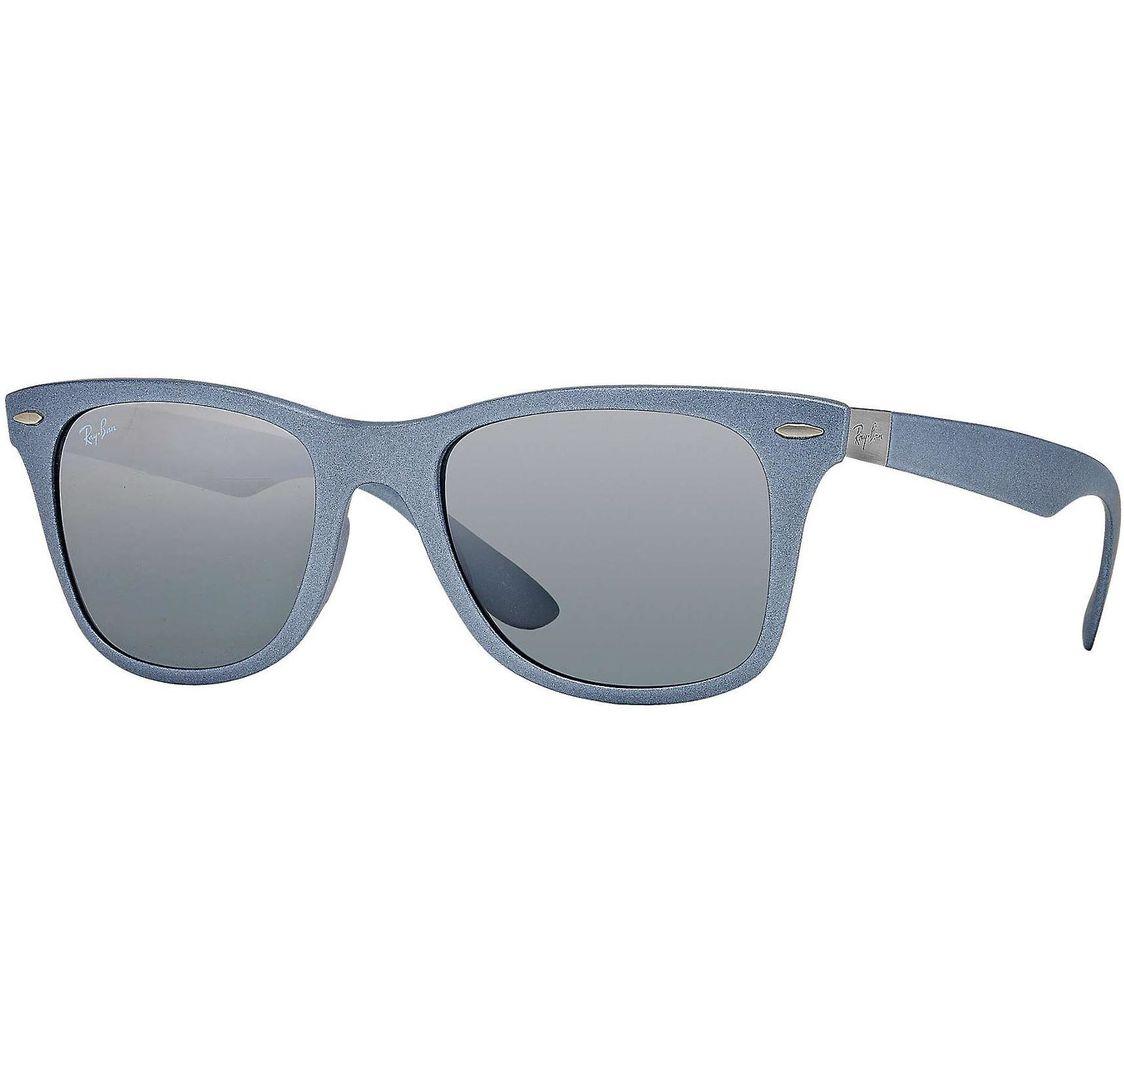 Buy Ray-ban Wayfarer Liteforce Silver Grey/grey Gradient Mirror Lens in Dubai at cheap price